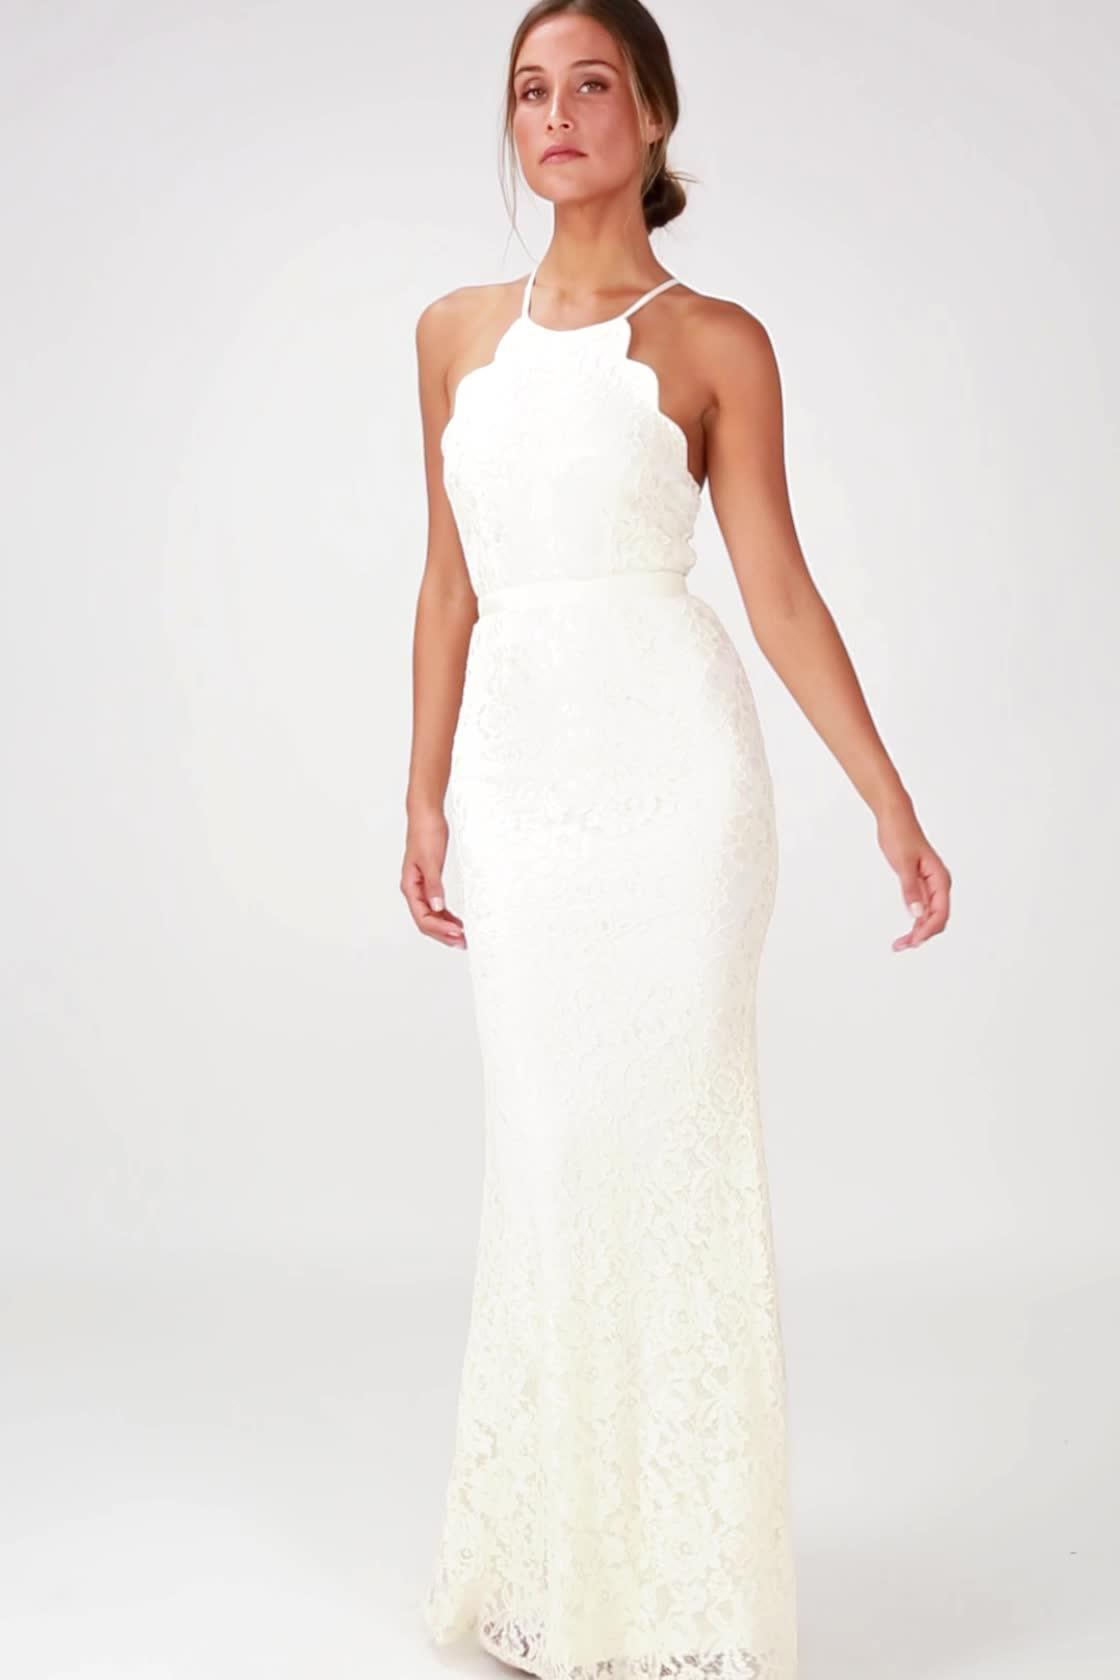 Zenith Navy Blue Lace Maxi Dress: Lulus Beaded Bodice Wedding Dress At Websimilar.org